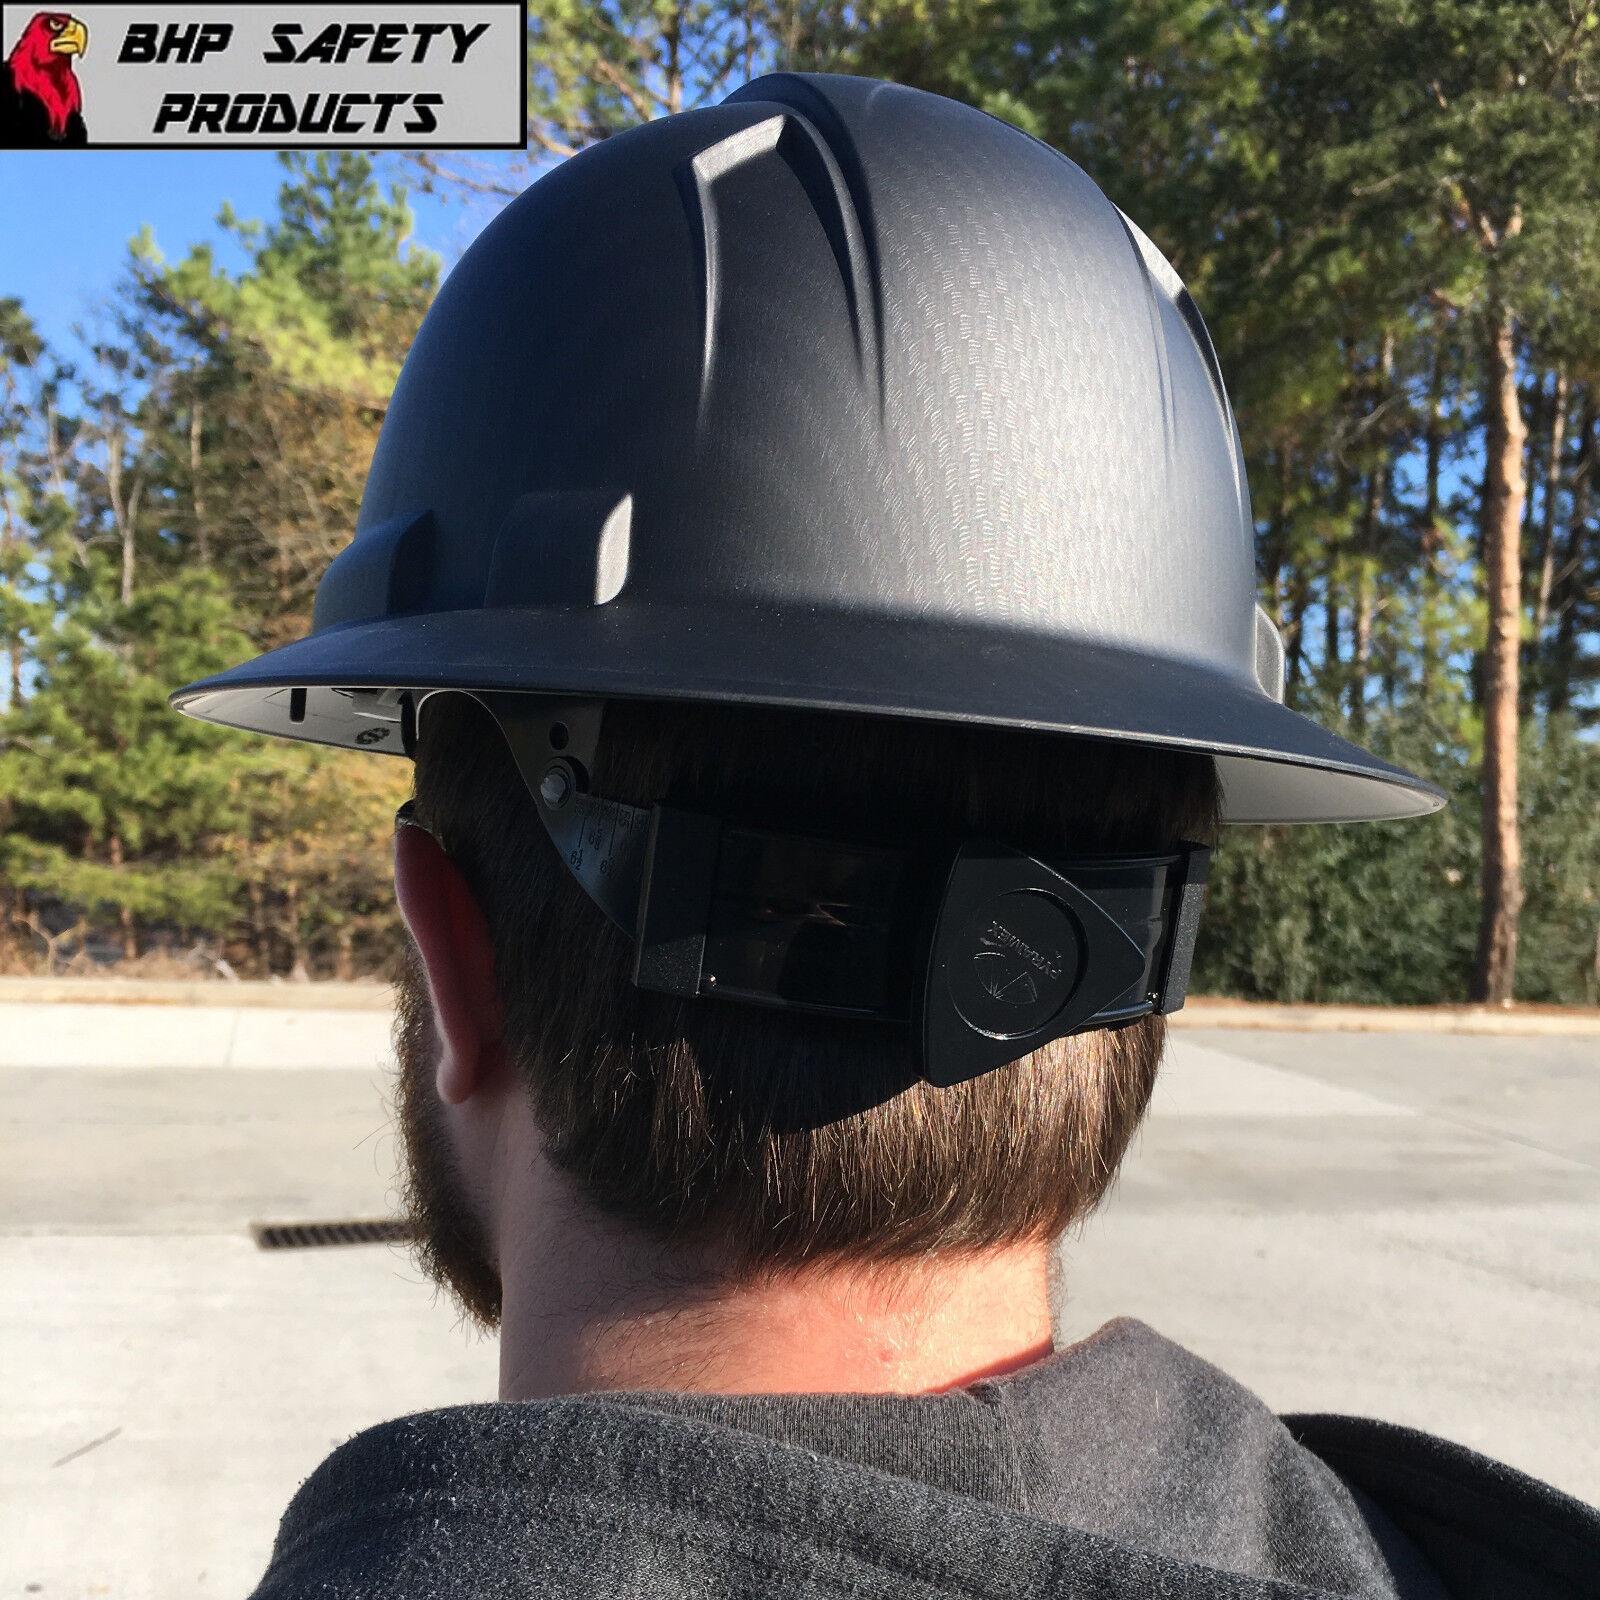 PYRAMEX RIDGELINE HARD HAT GRAPHITE PATTERN BLACK GRAY FULL BRIM SAFETY  HP54117 | Shopping Bin - Search eBay faster